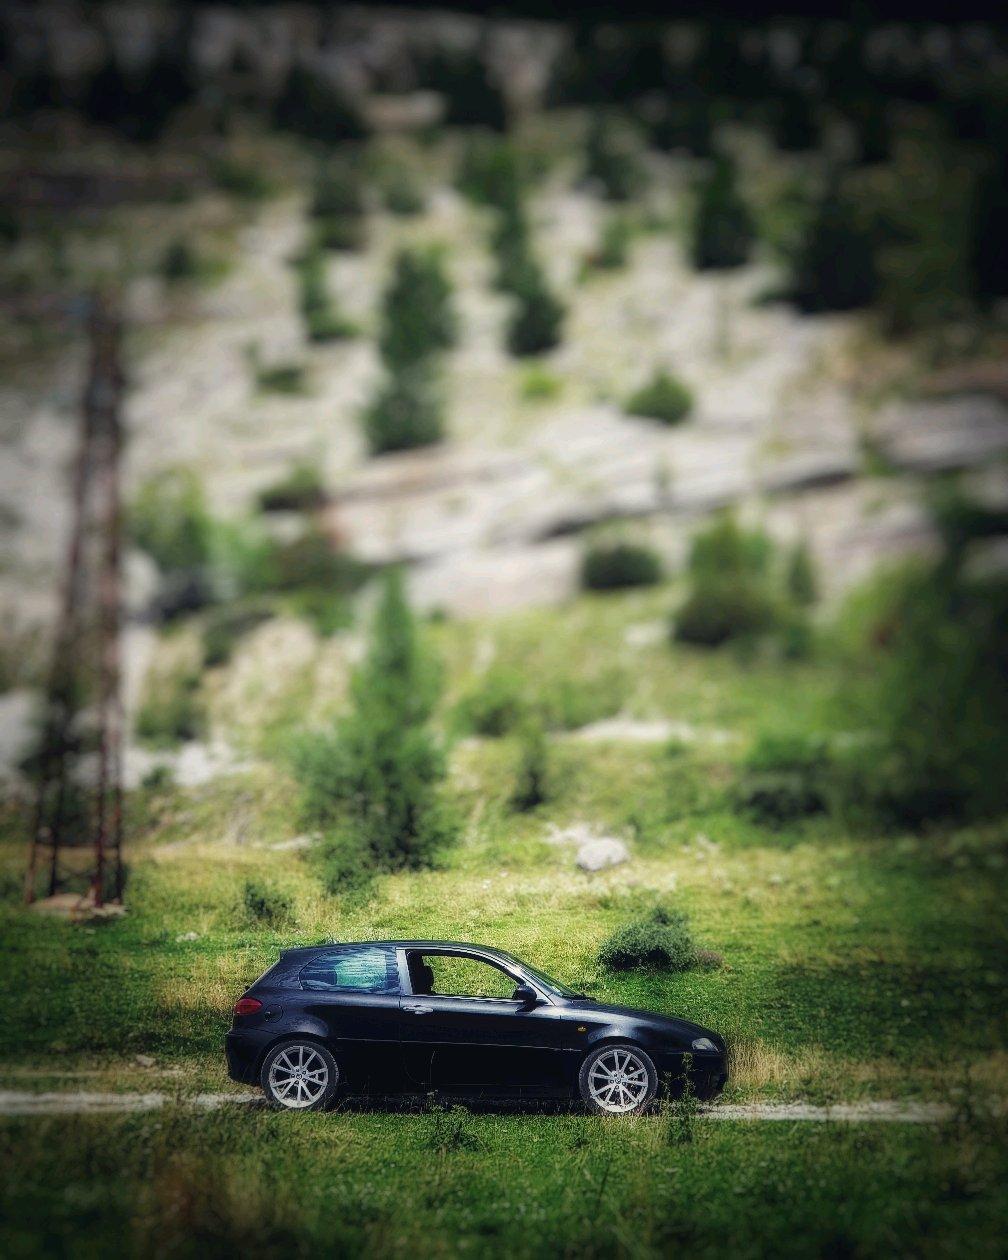 My Alfa Romeo 147